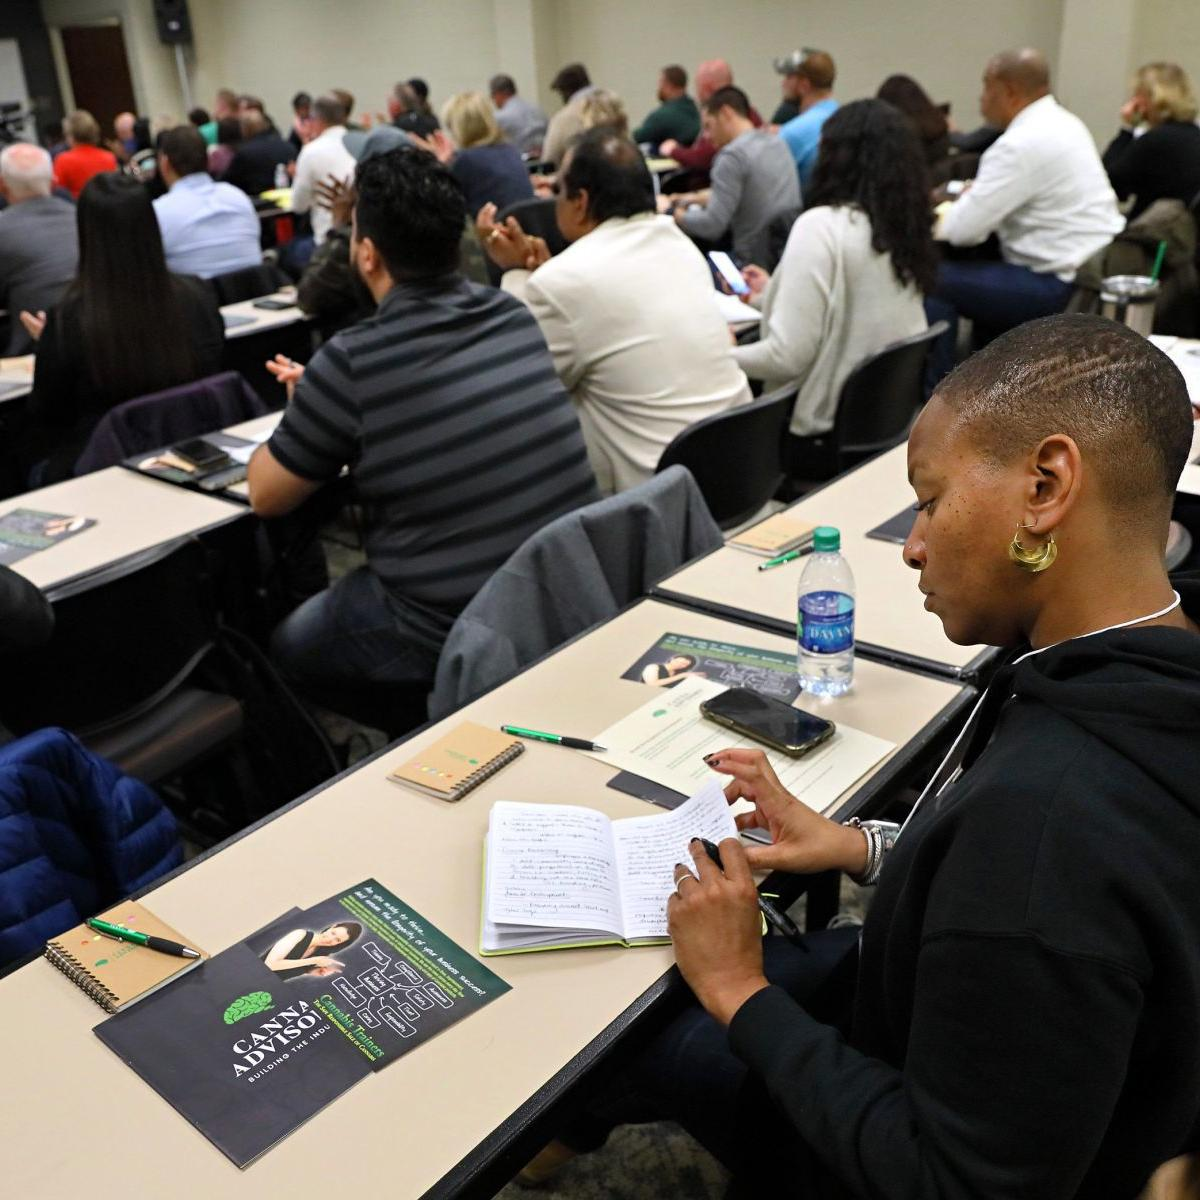 Selection process for Missouri marijuana licenses needs